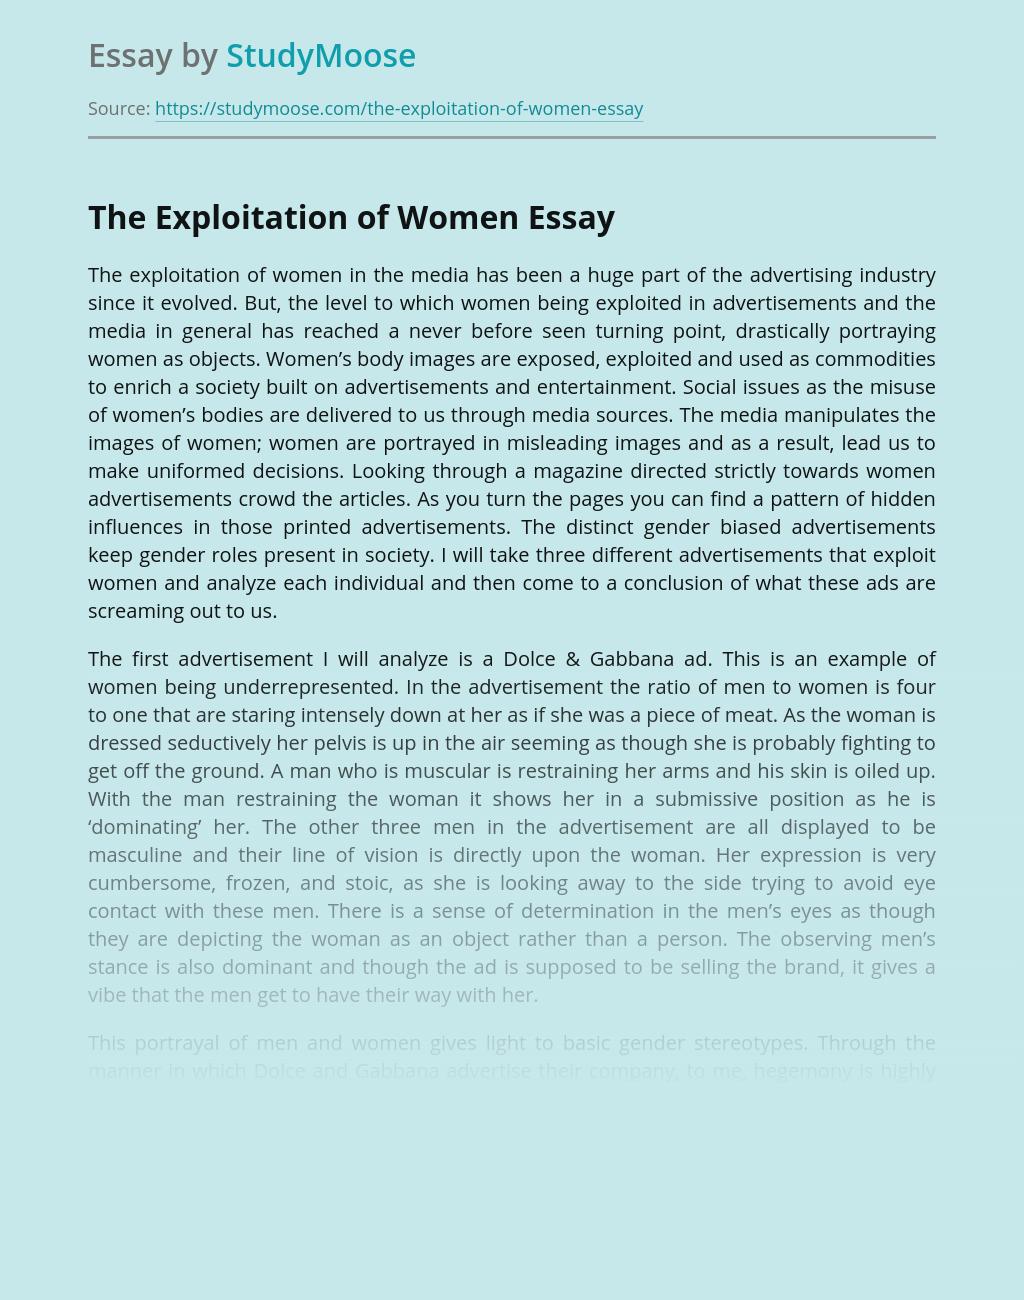 The Exploitation of Women